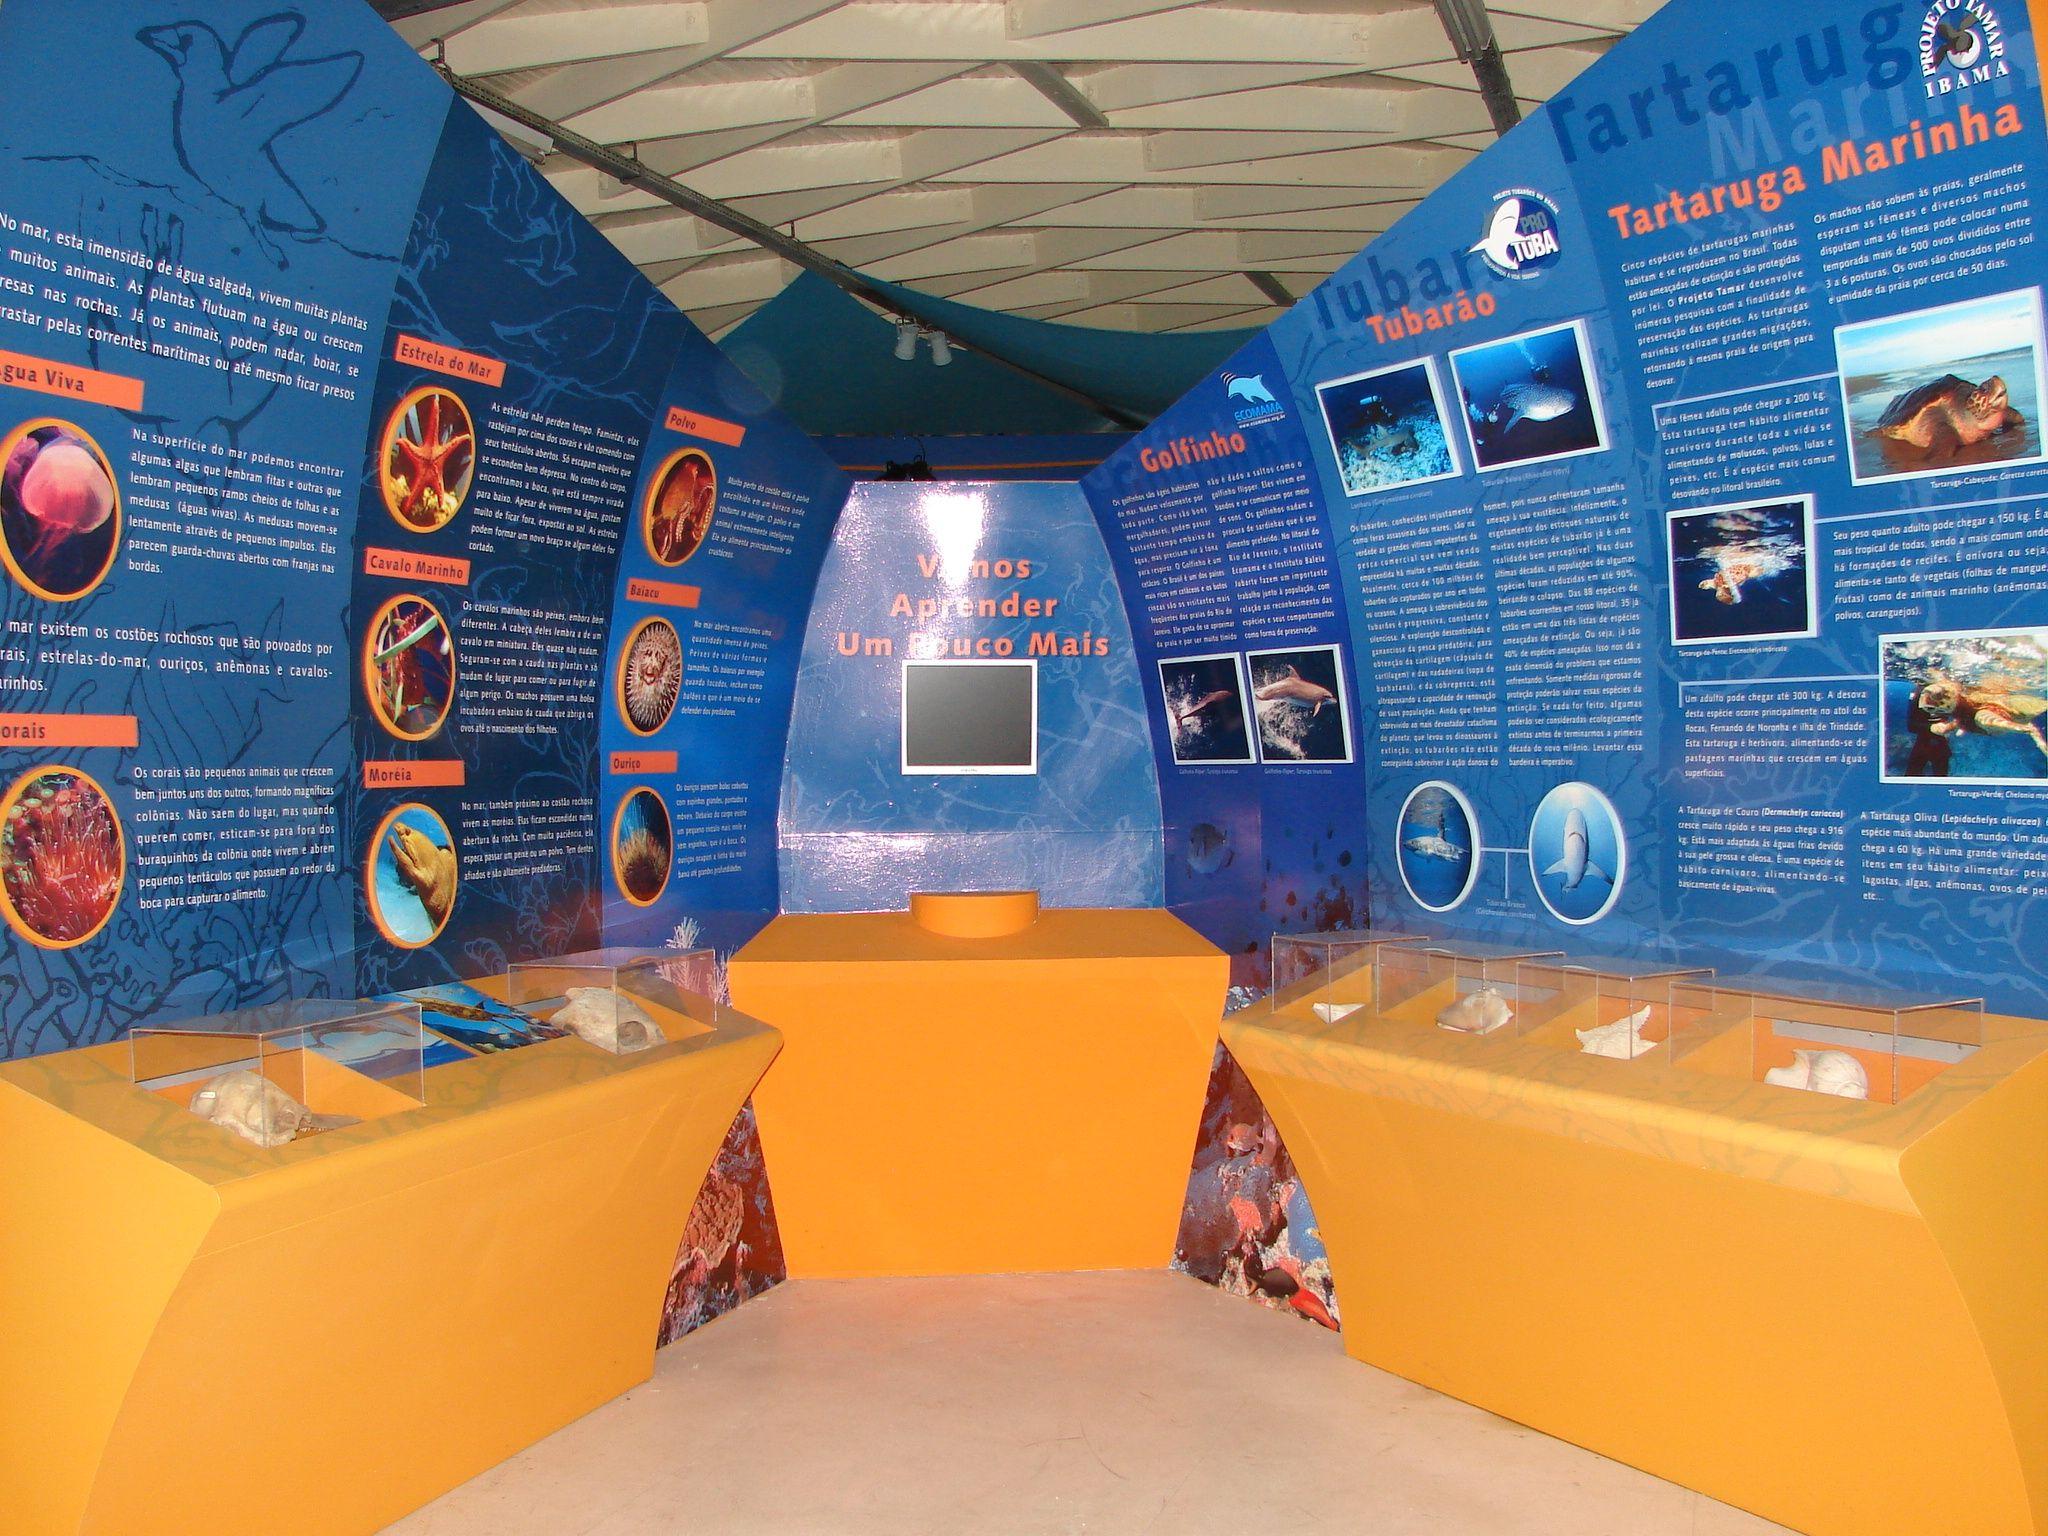 wayfinding exhibition museu da fauna rio de janeiro rj